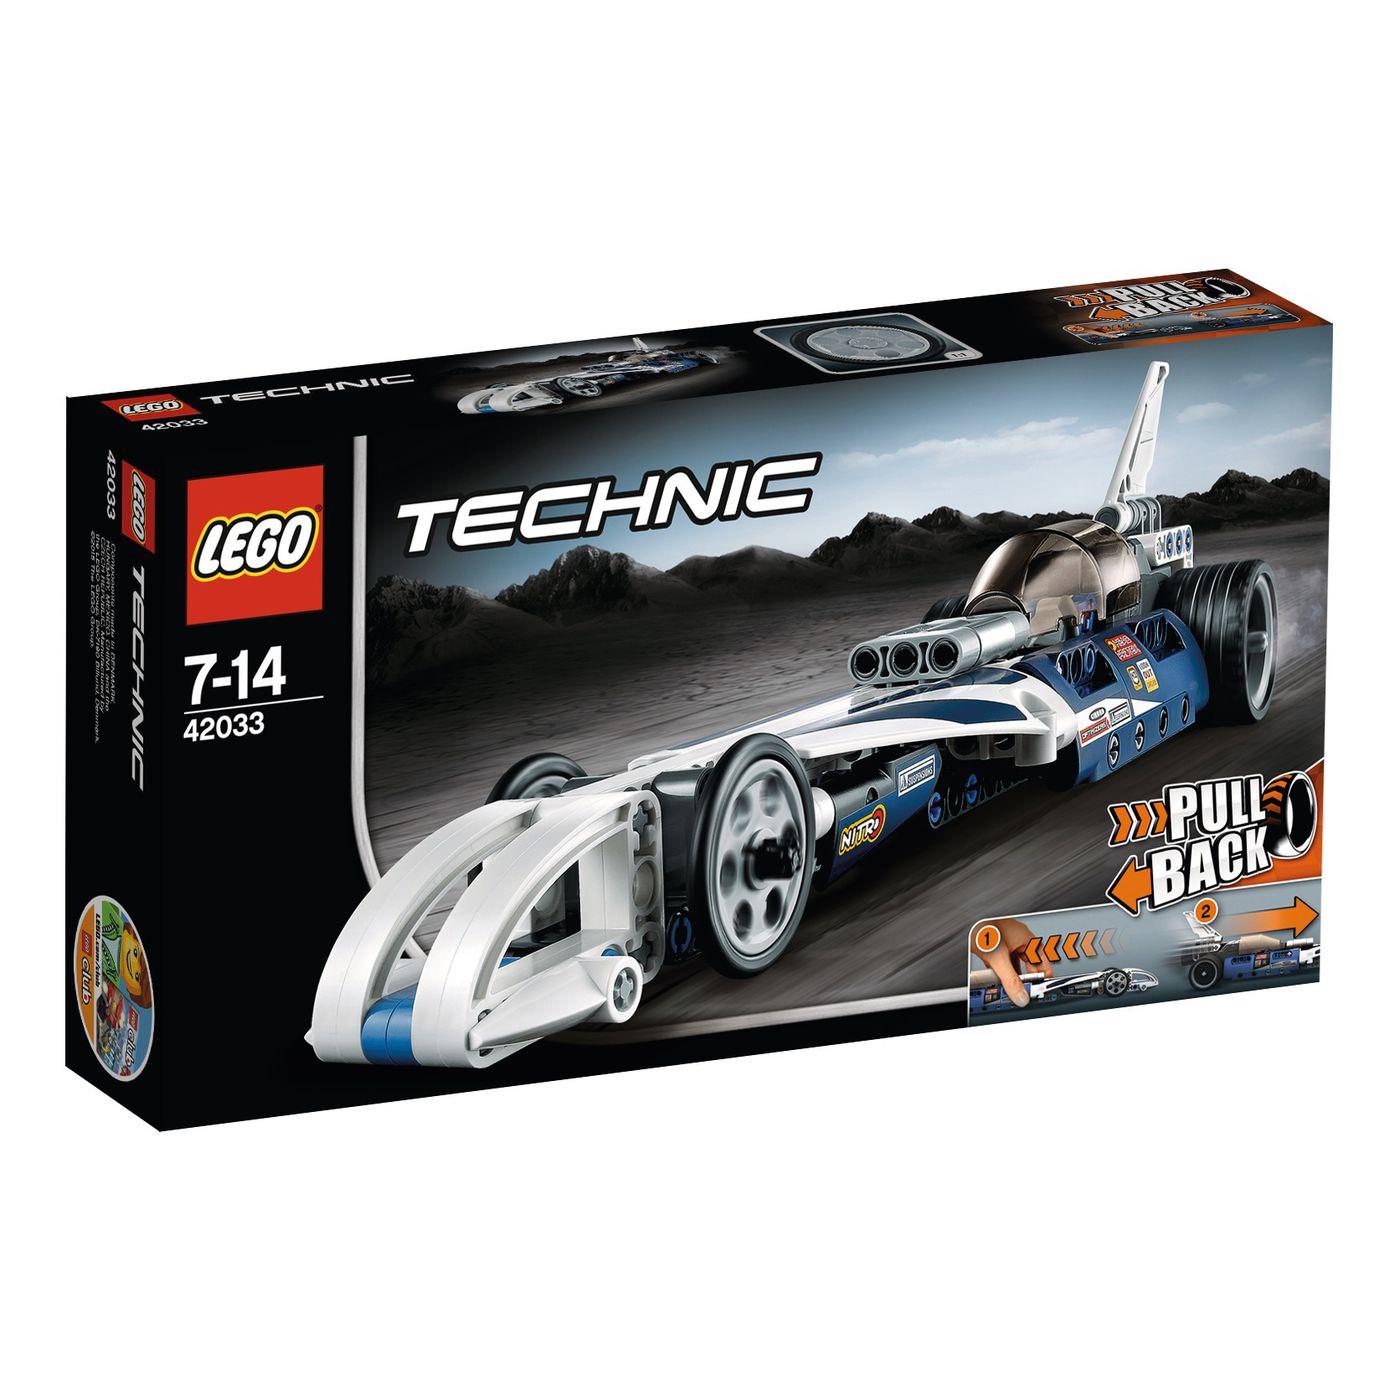 Lego weit unter UVP z.B LEGO® Technic Action Raketenauto 42033 für 4.95 € statt 19.99 €